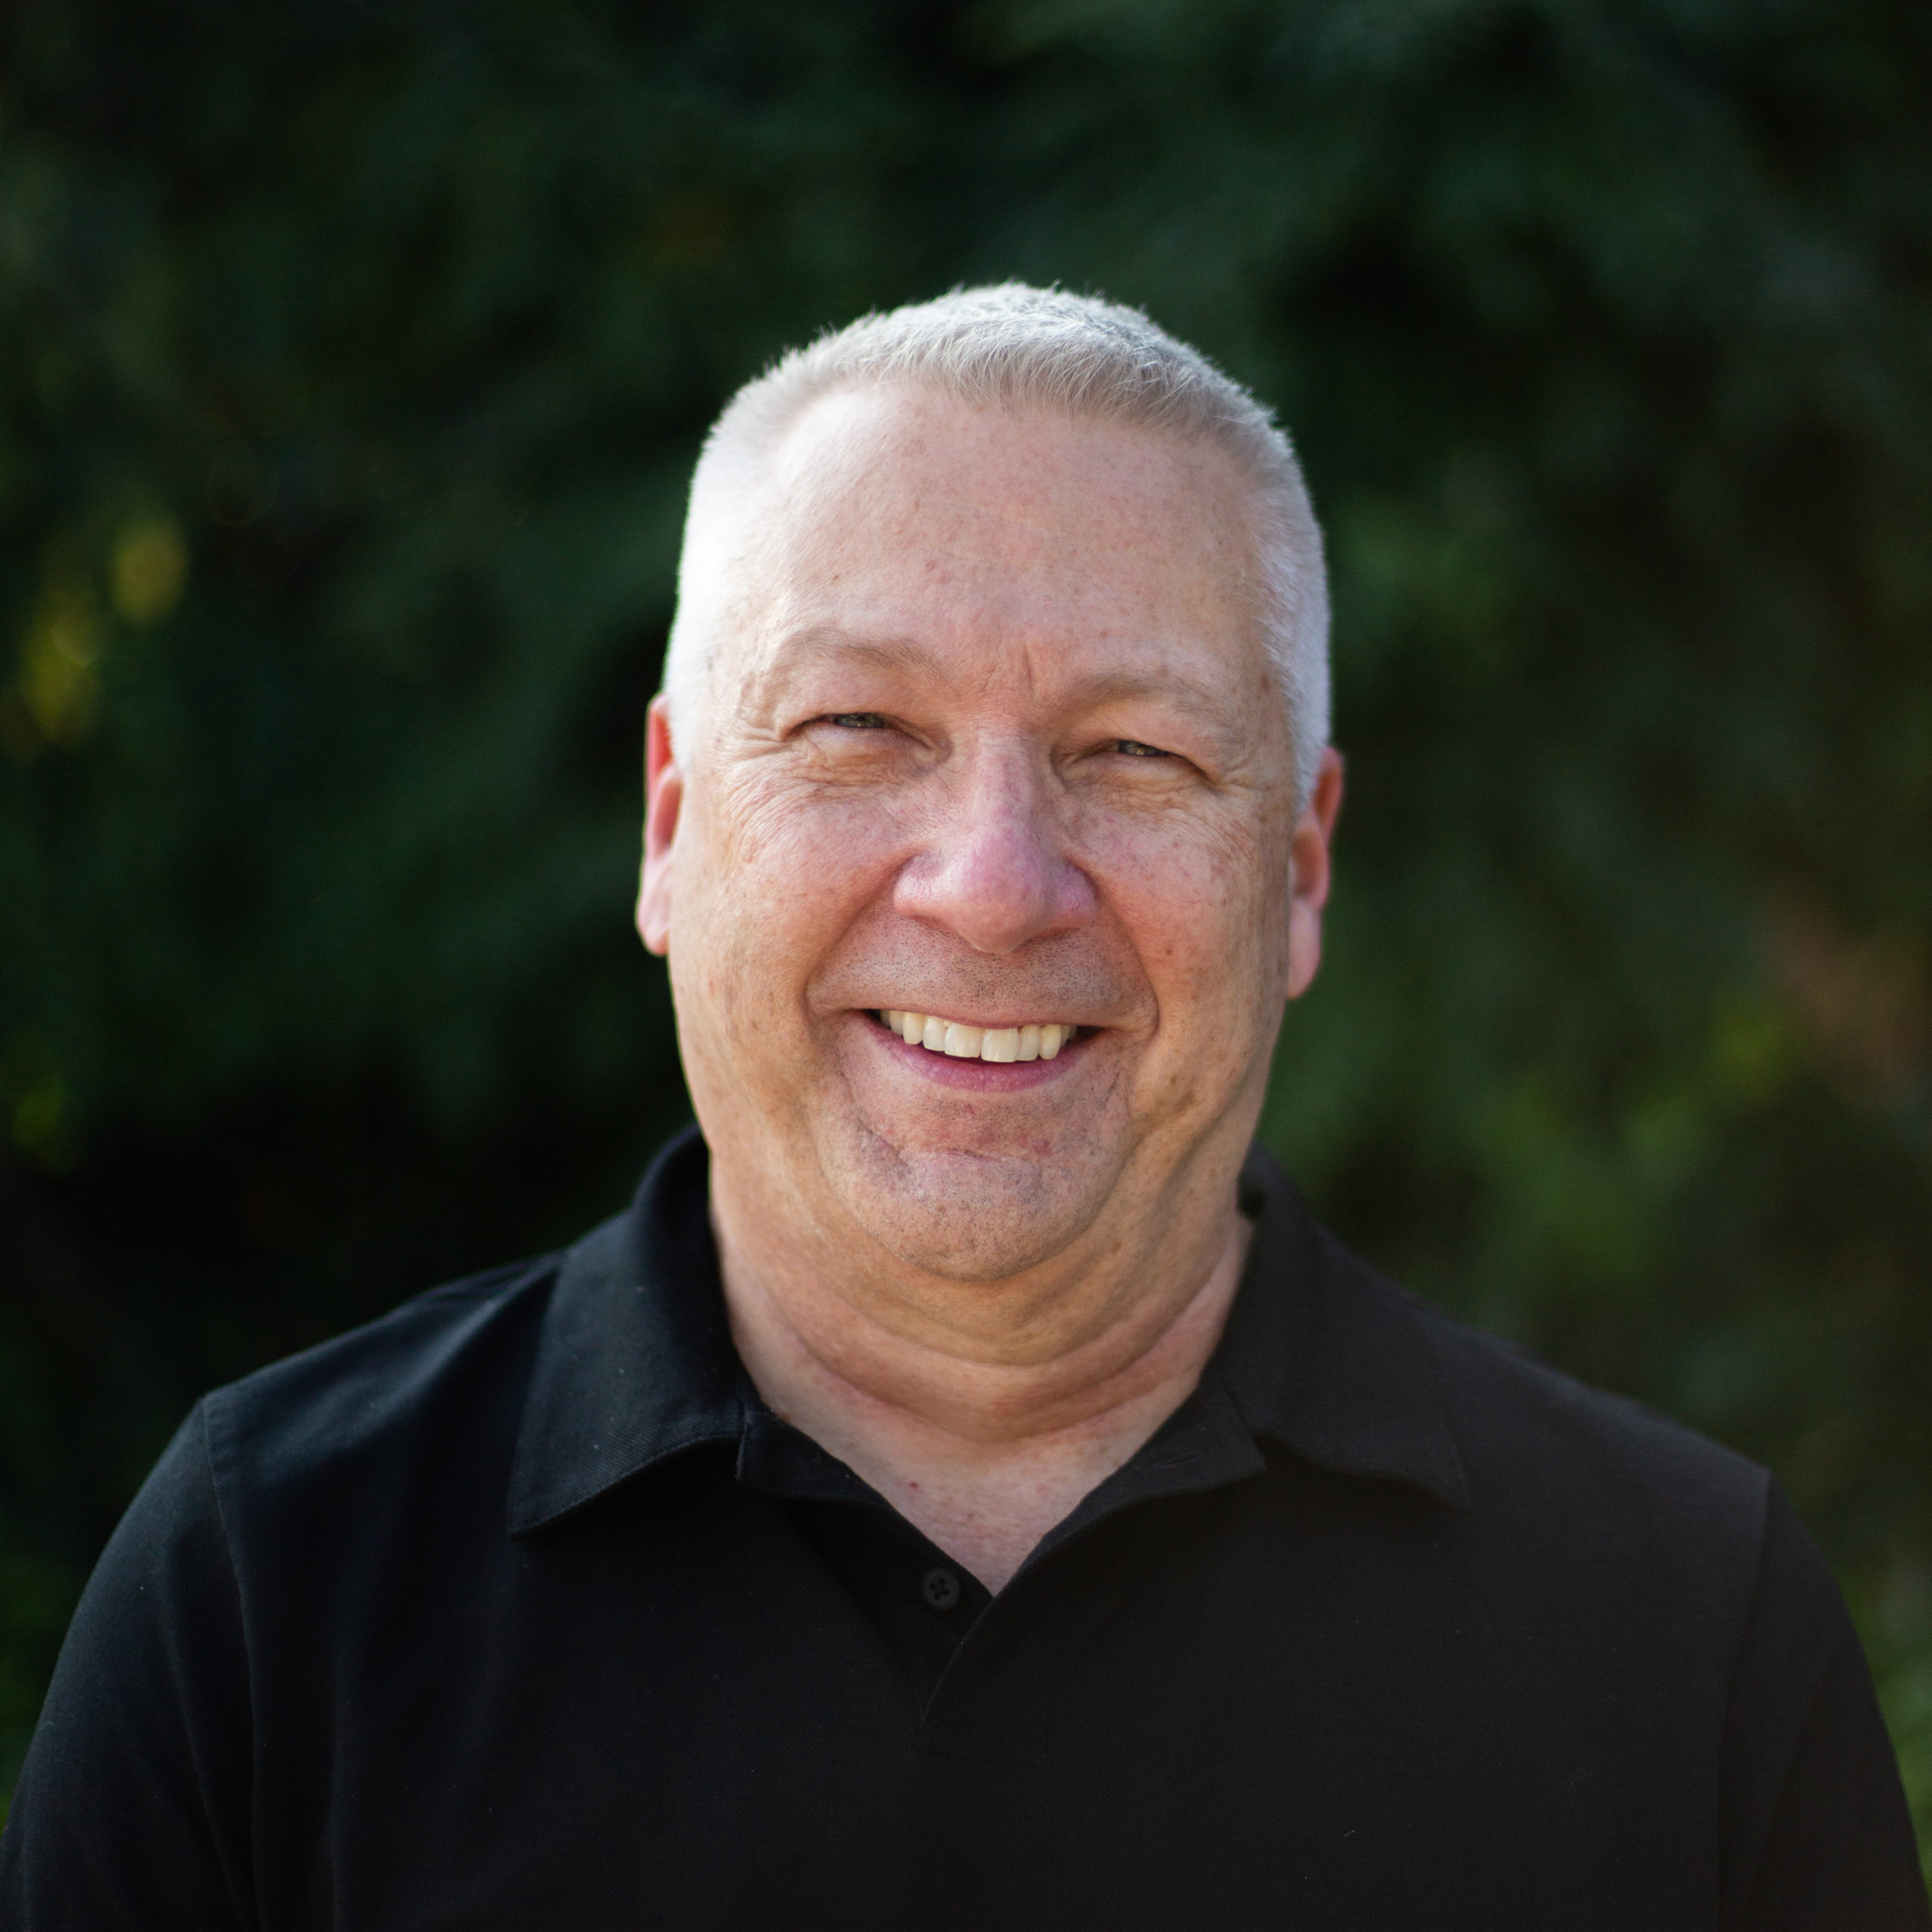 Bob Rhoades